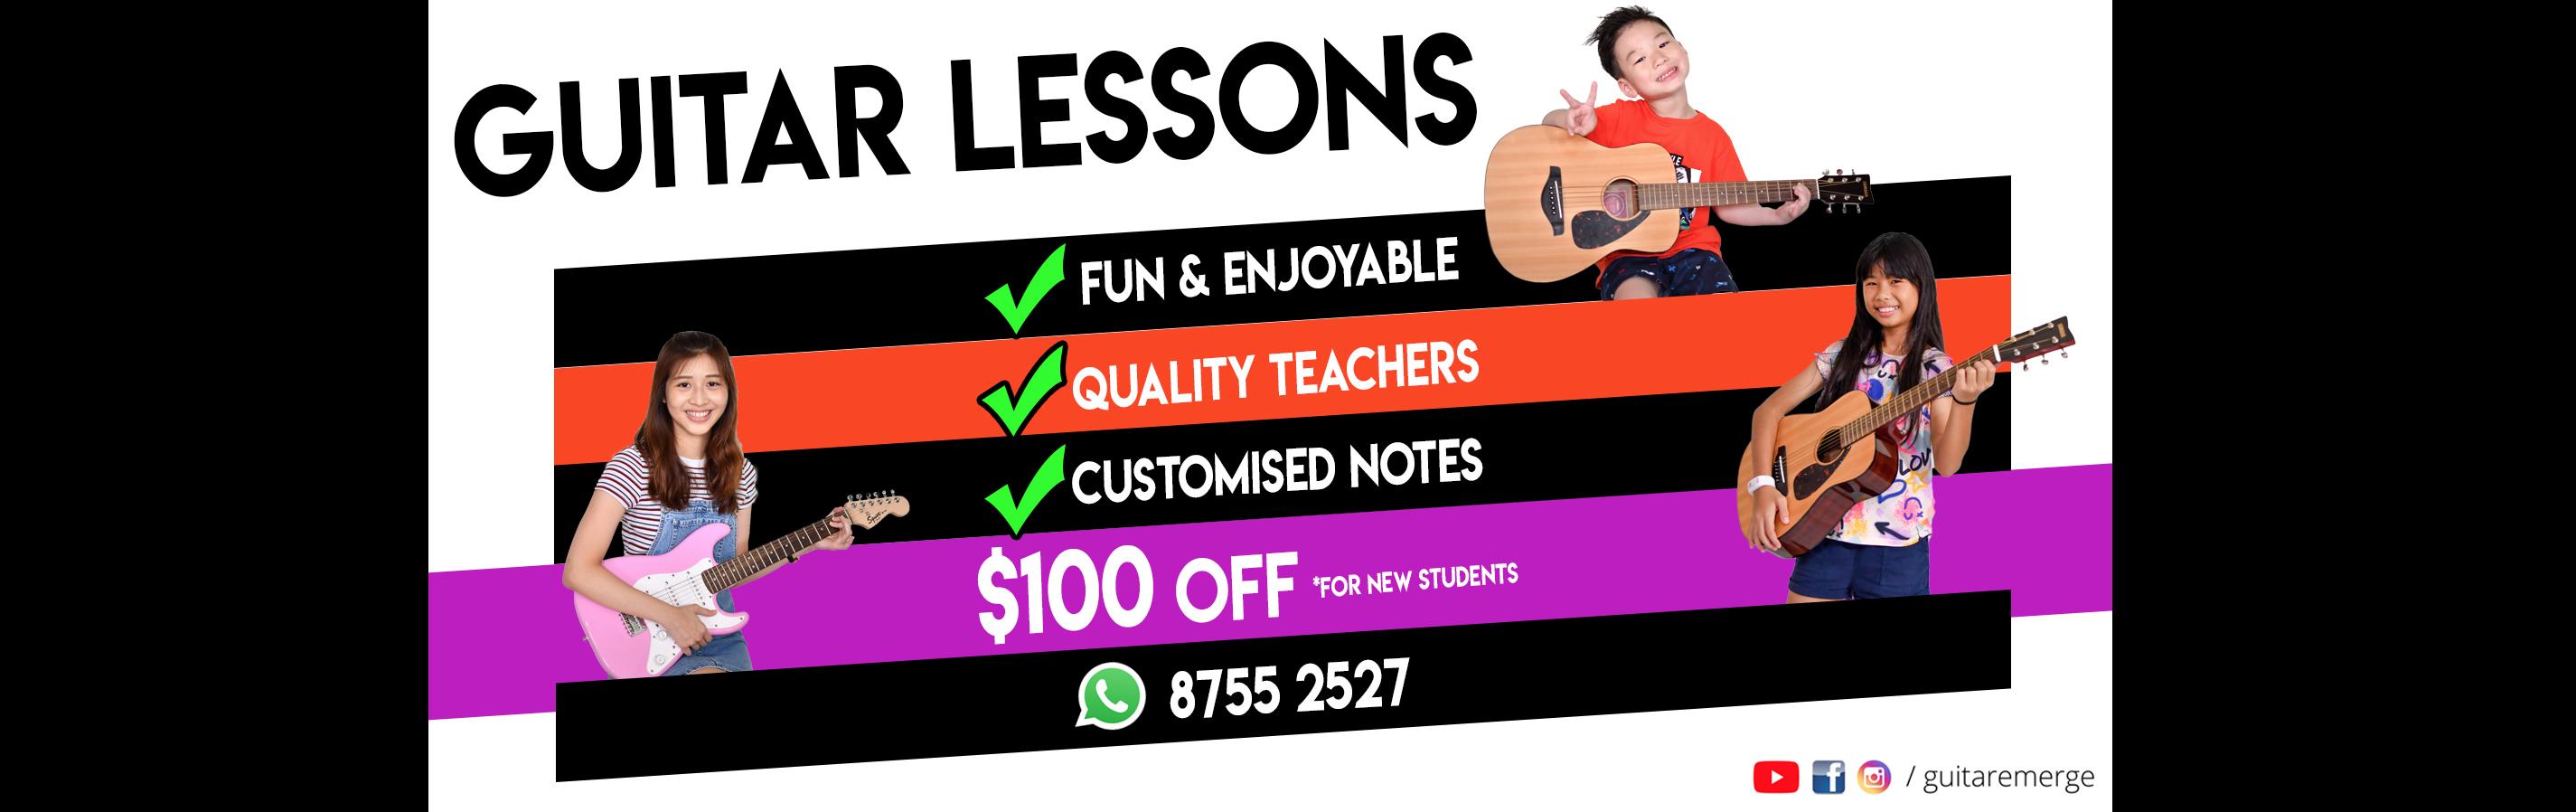 Guitar Lessons Promo